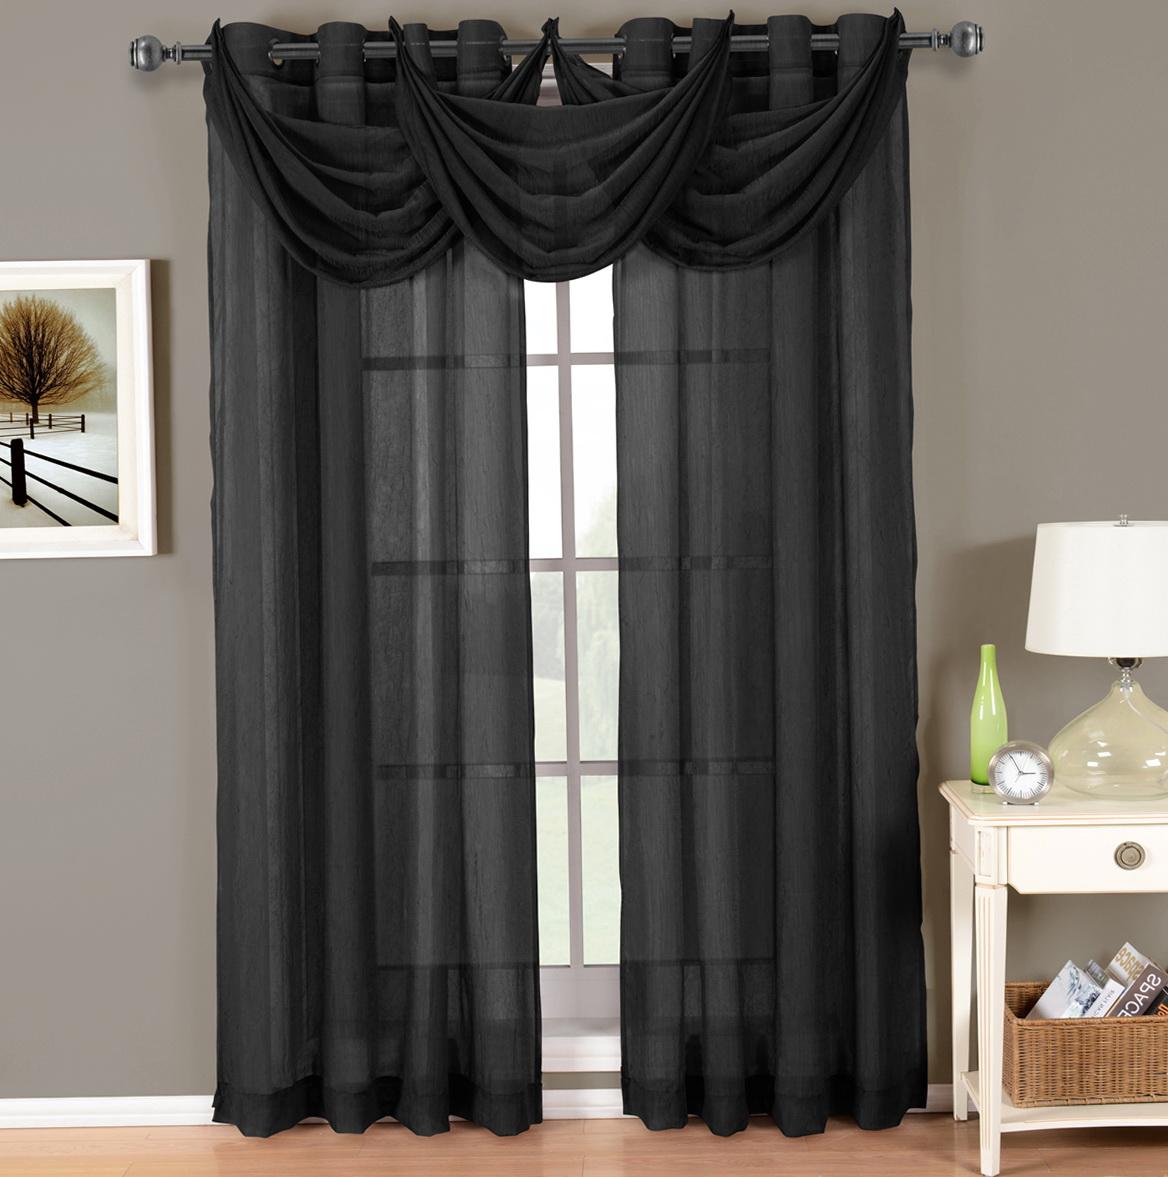 Small Bedroom Chandelier Dark Grey Sheer Curtains Home Design Ideas